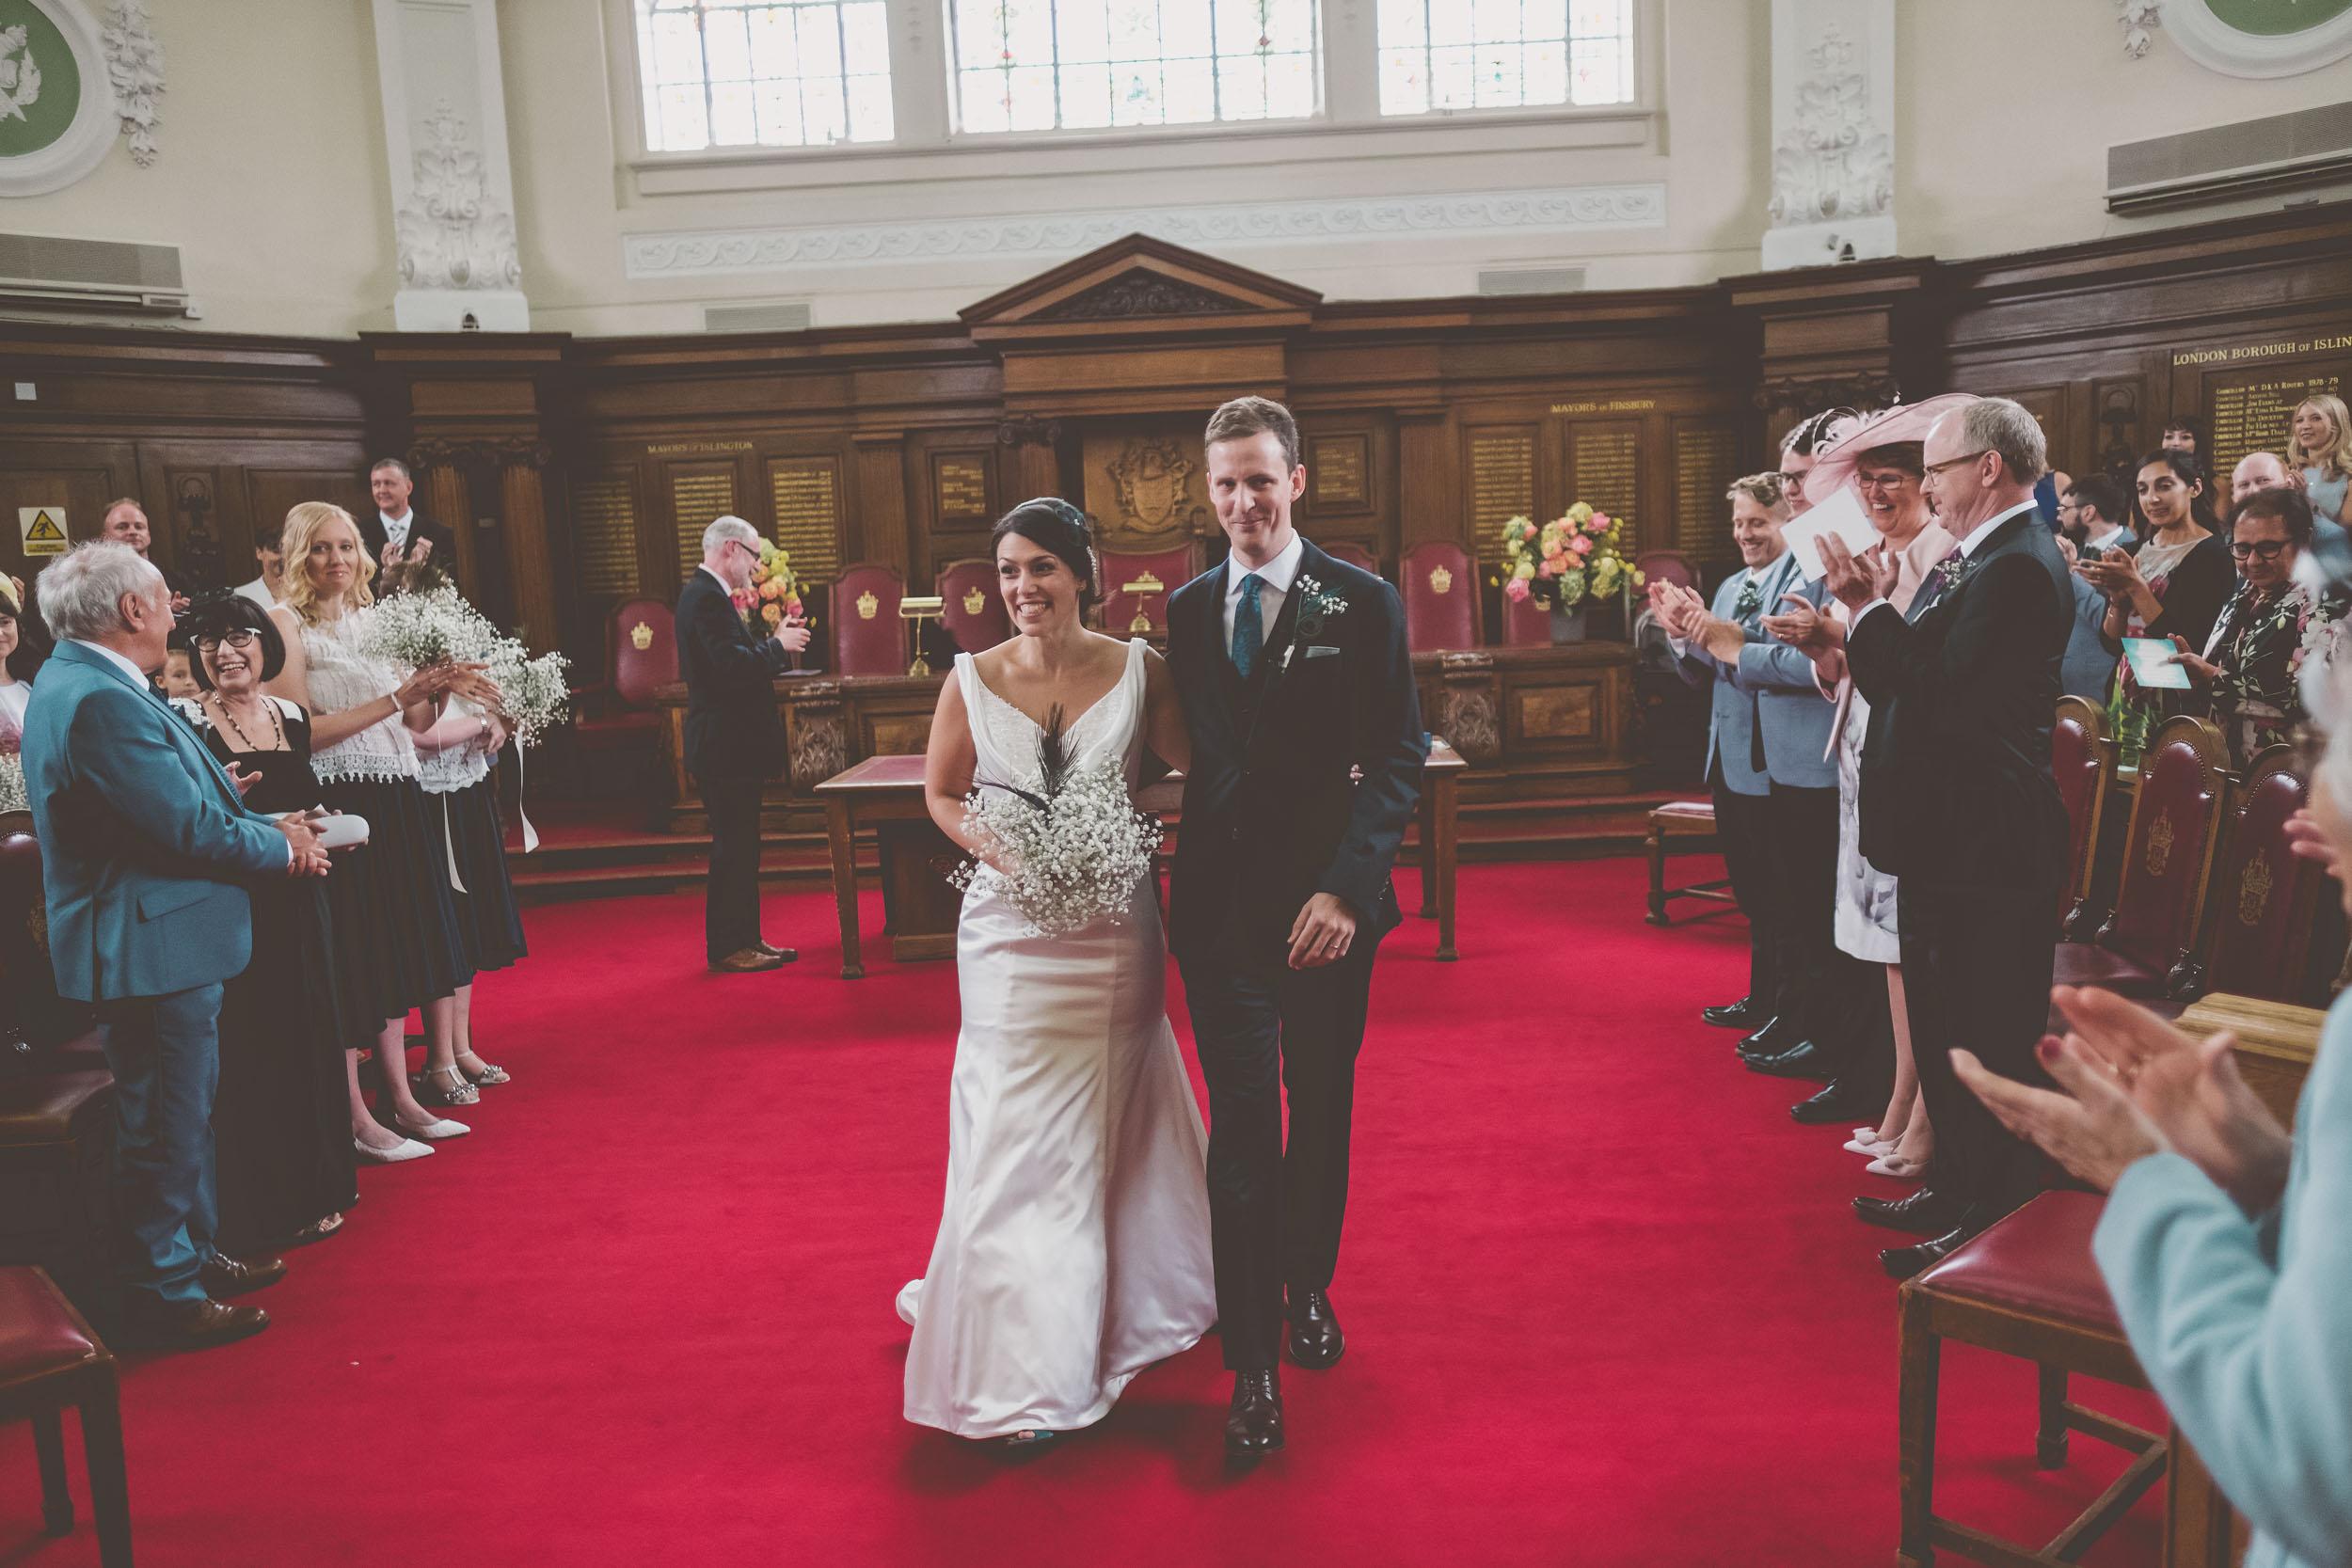 islington-town-hall-4th-floor-studios-wedding124.jpg